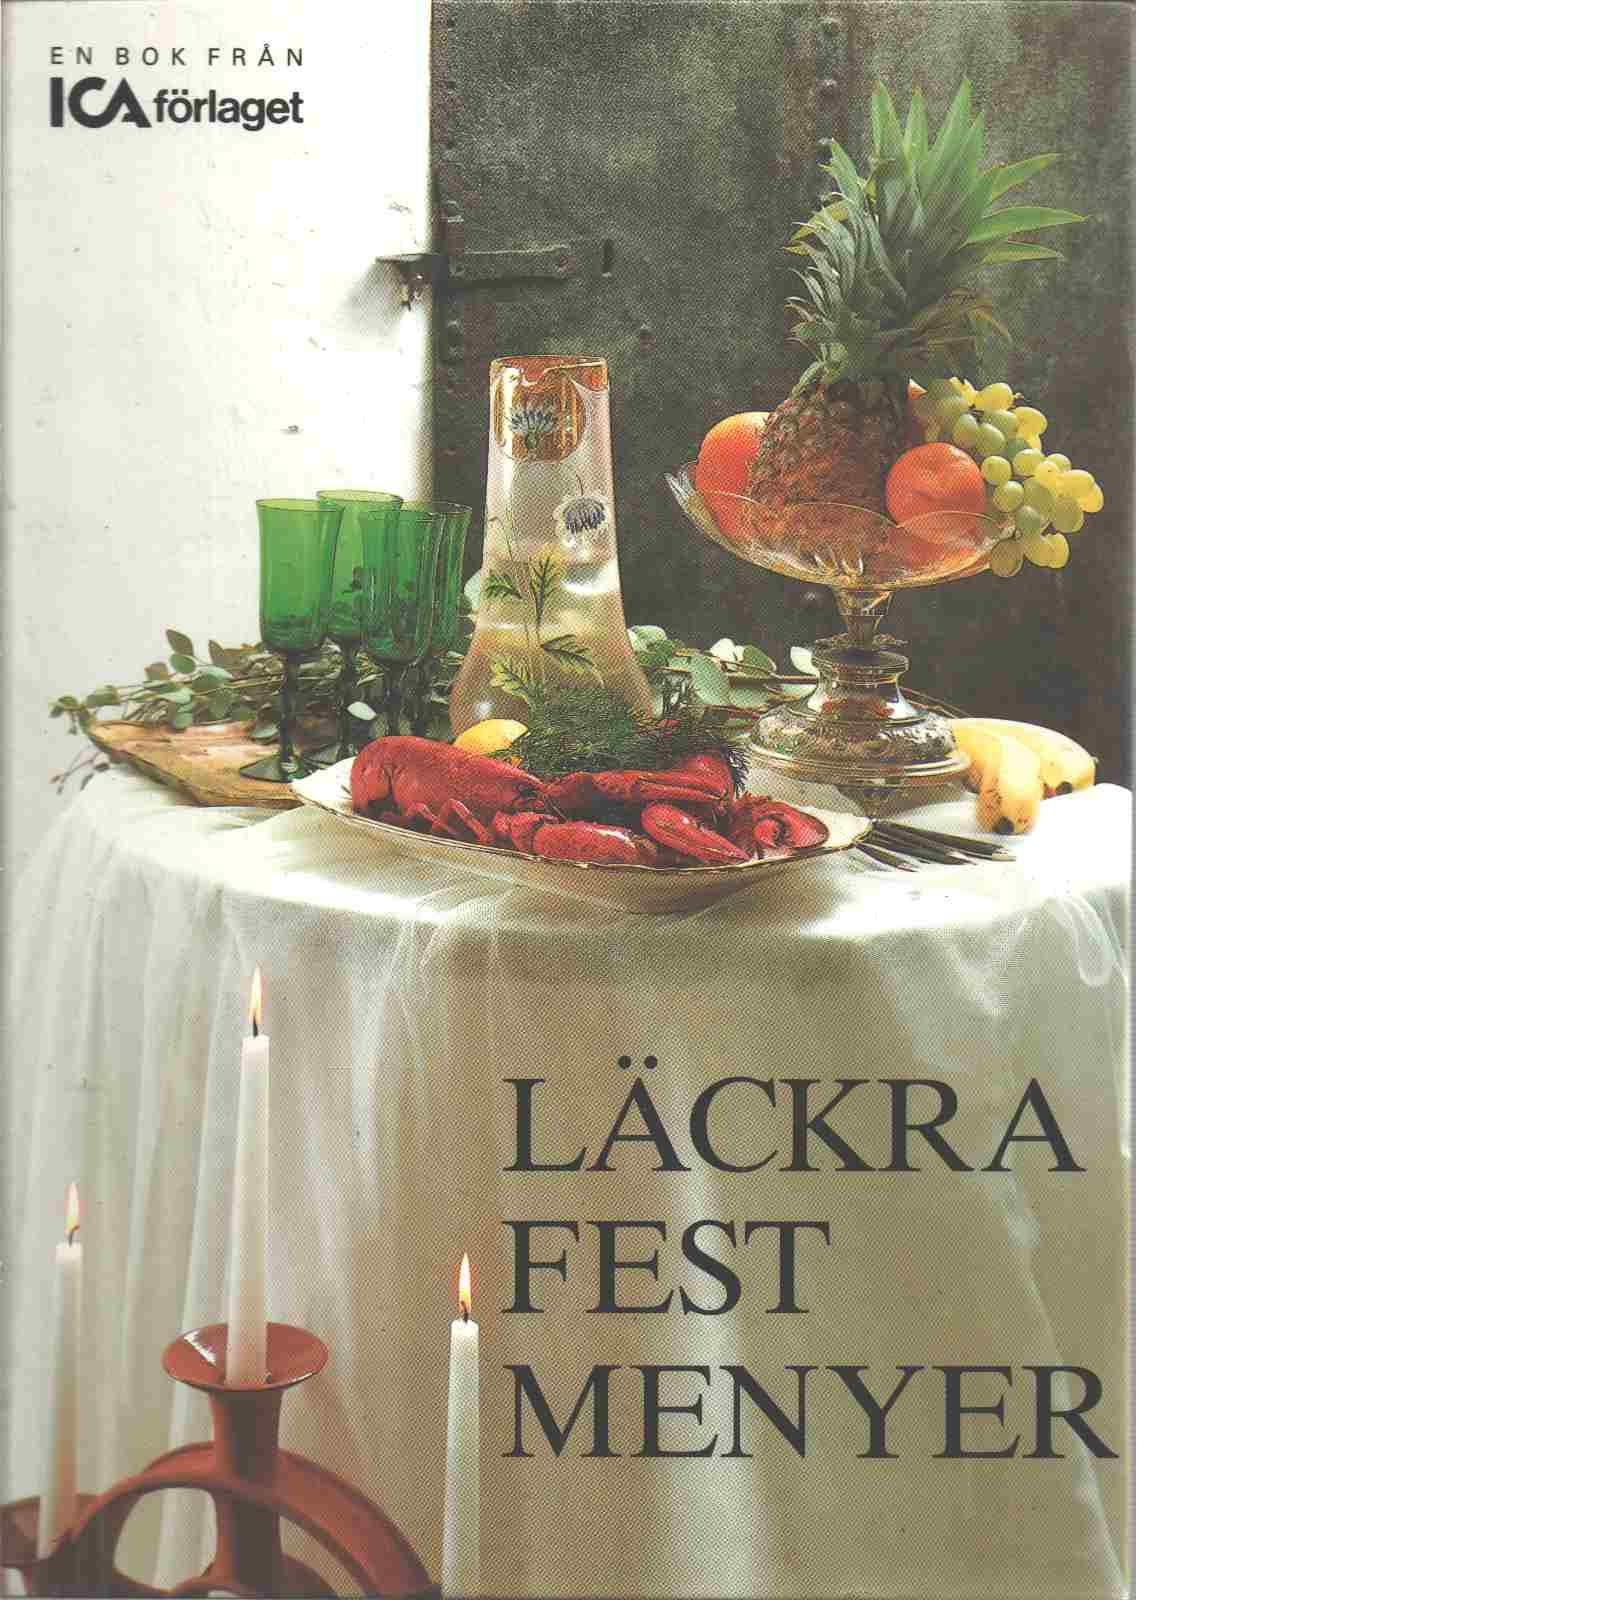 Läckra festmenyer - Red. Andersson, Lise-Lott